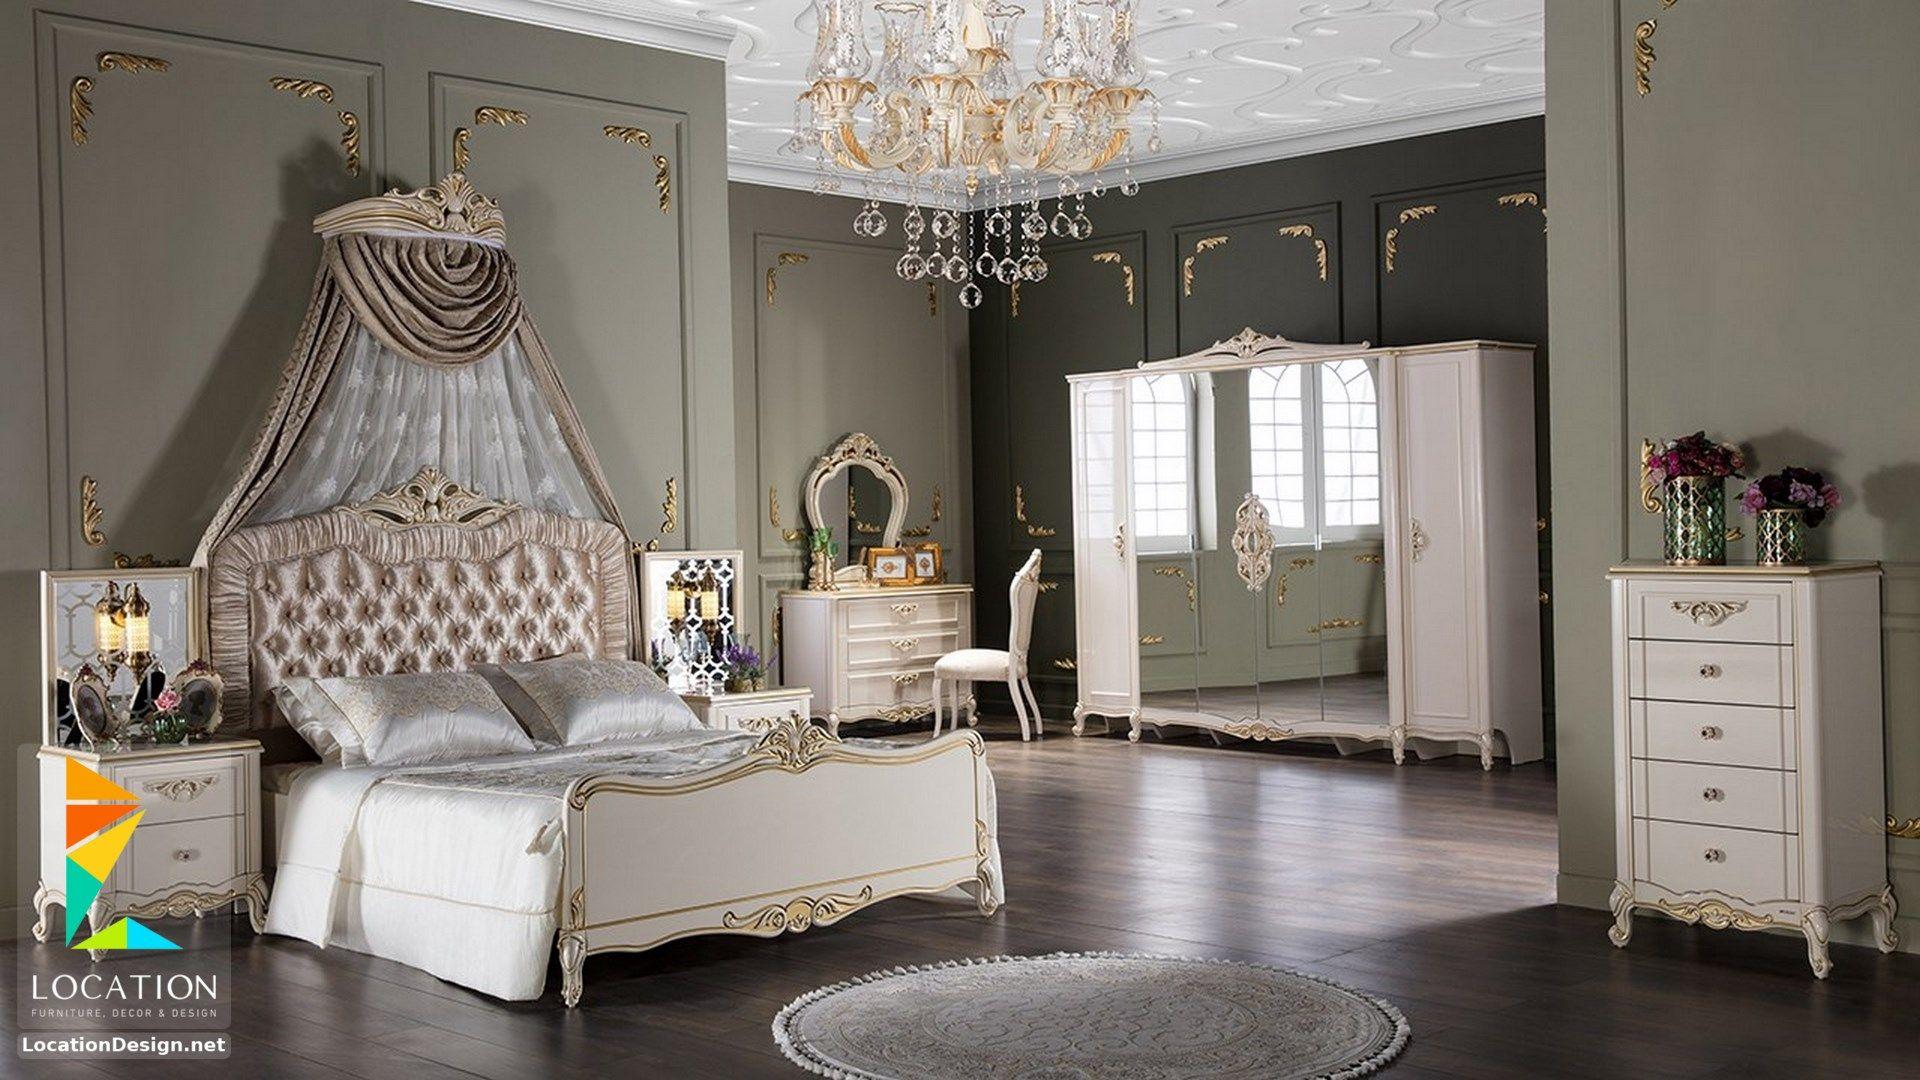 احدث موديلات و اشكال غرف نوم تركي 2019 2020 Luxury White Bedroom Furniture Bedroom Sets Bedroom Photos